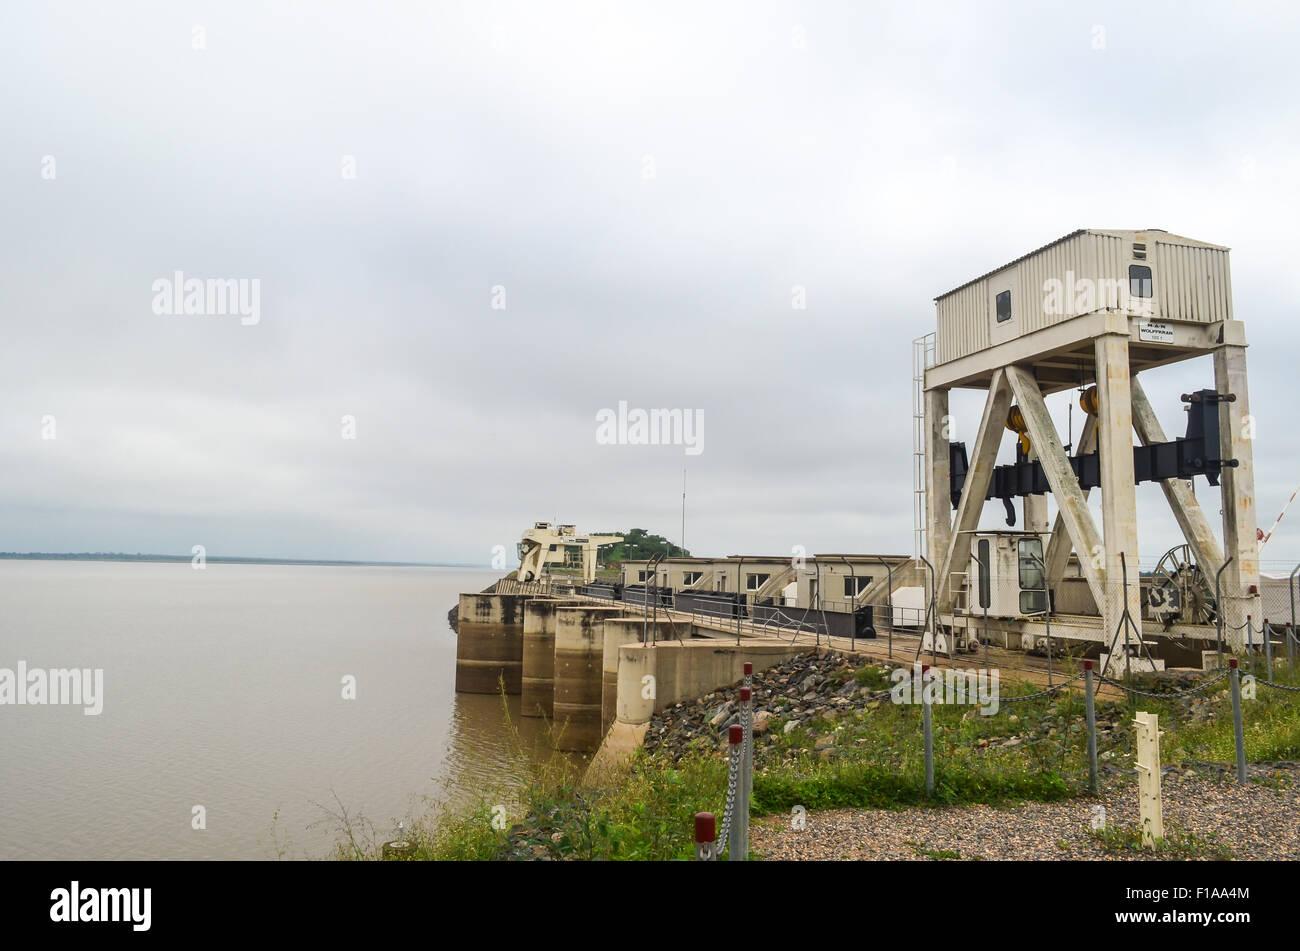 Nangbeto hydropowerplant in Togo - Stock Image